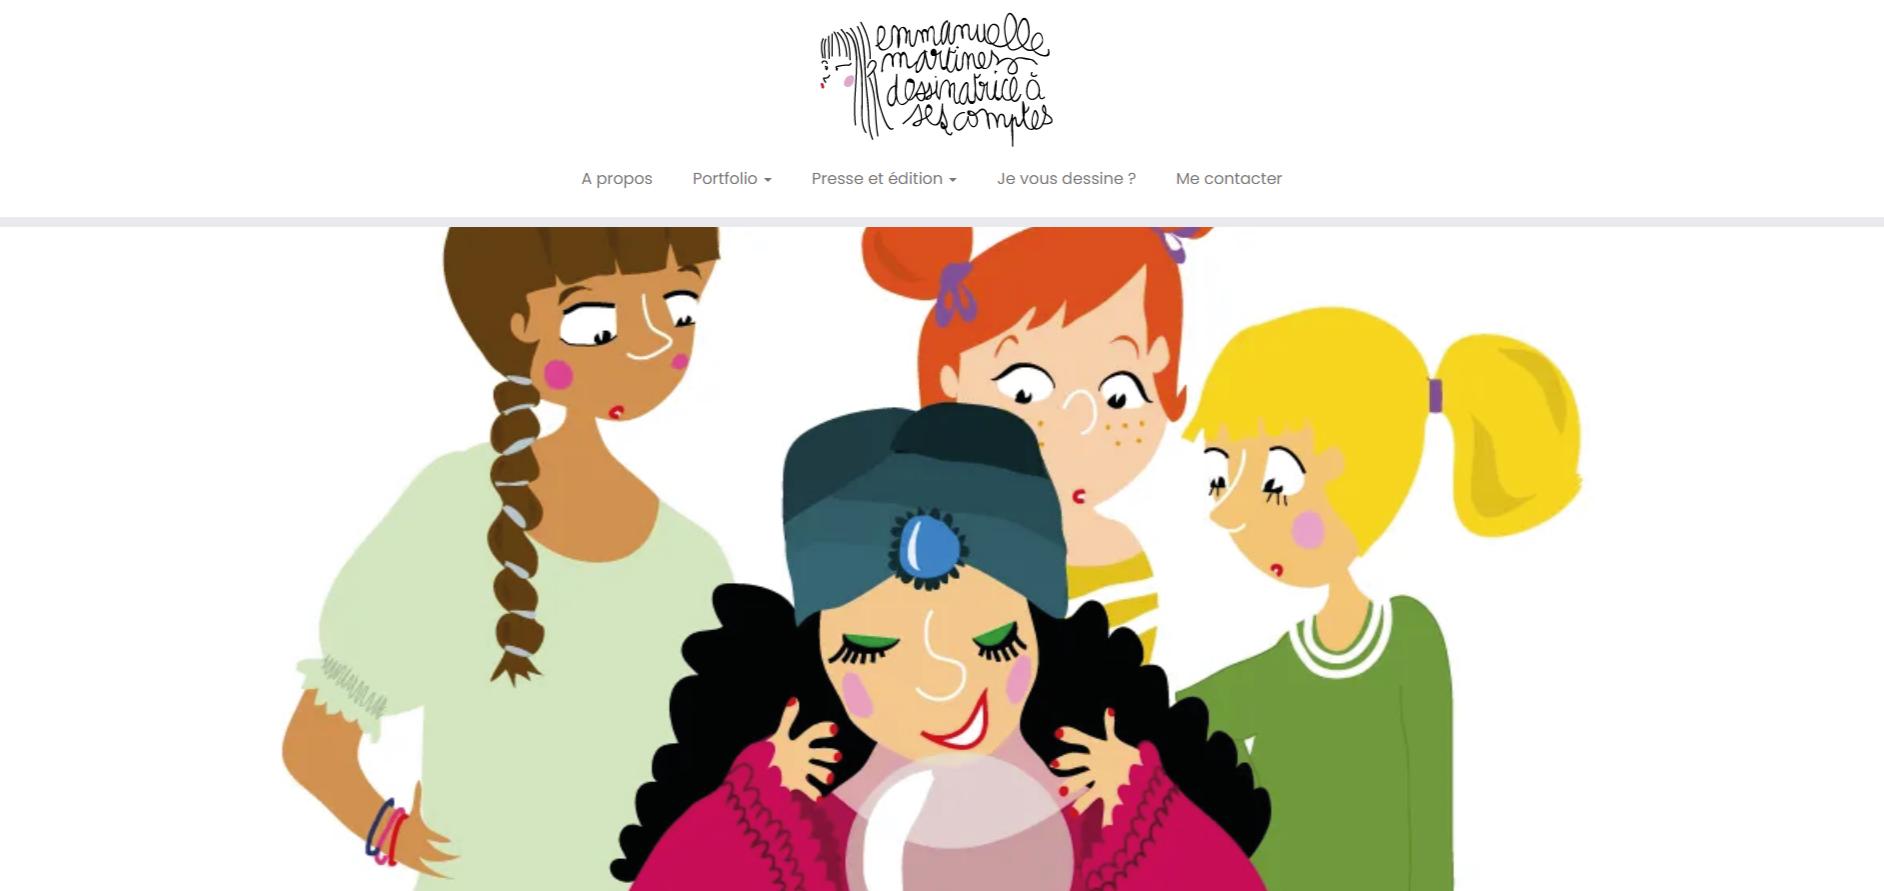 site illustratrice emmanuelle martinez - Book d'illustrations